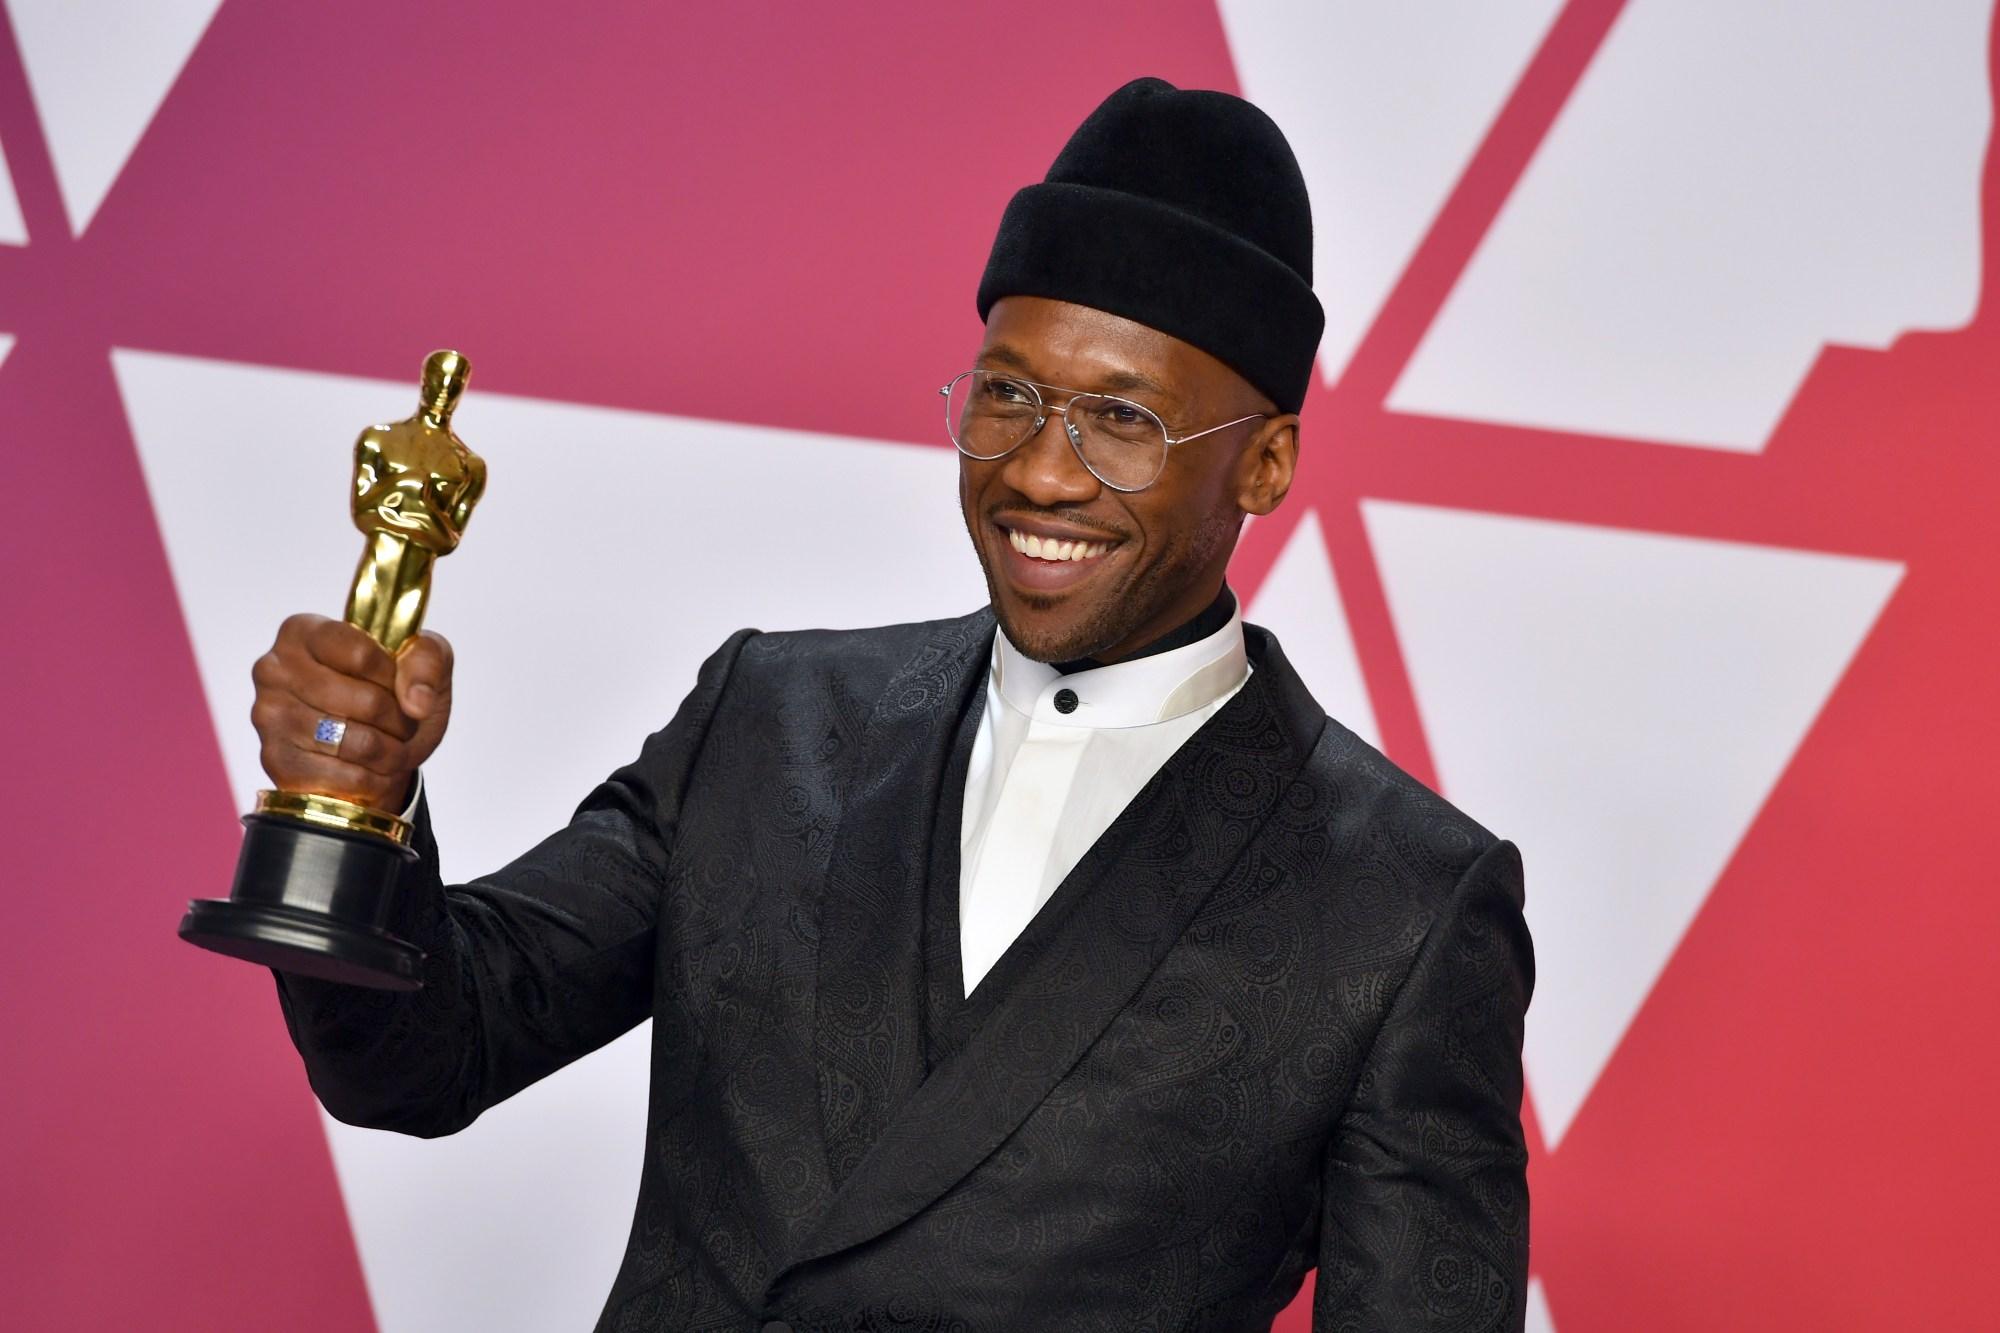 91st_Academy_Awards_-_Press_Room_88677-159532-159532.jpg29853850